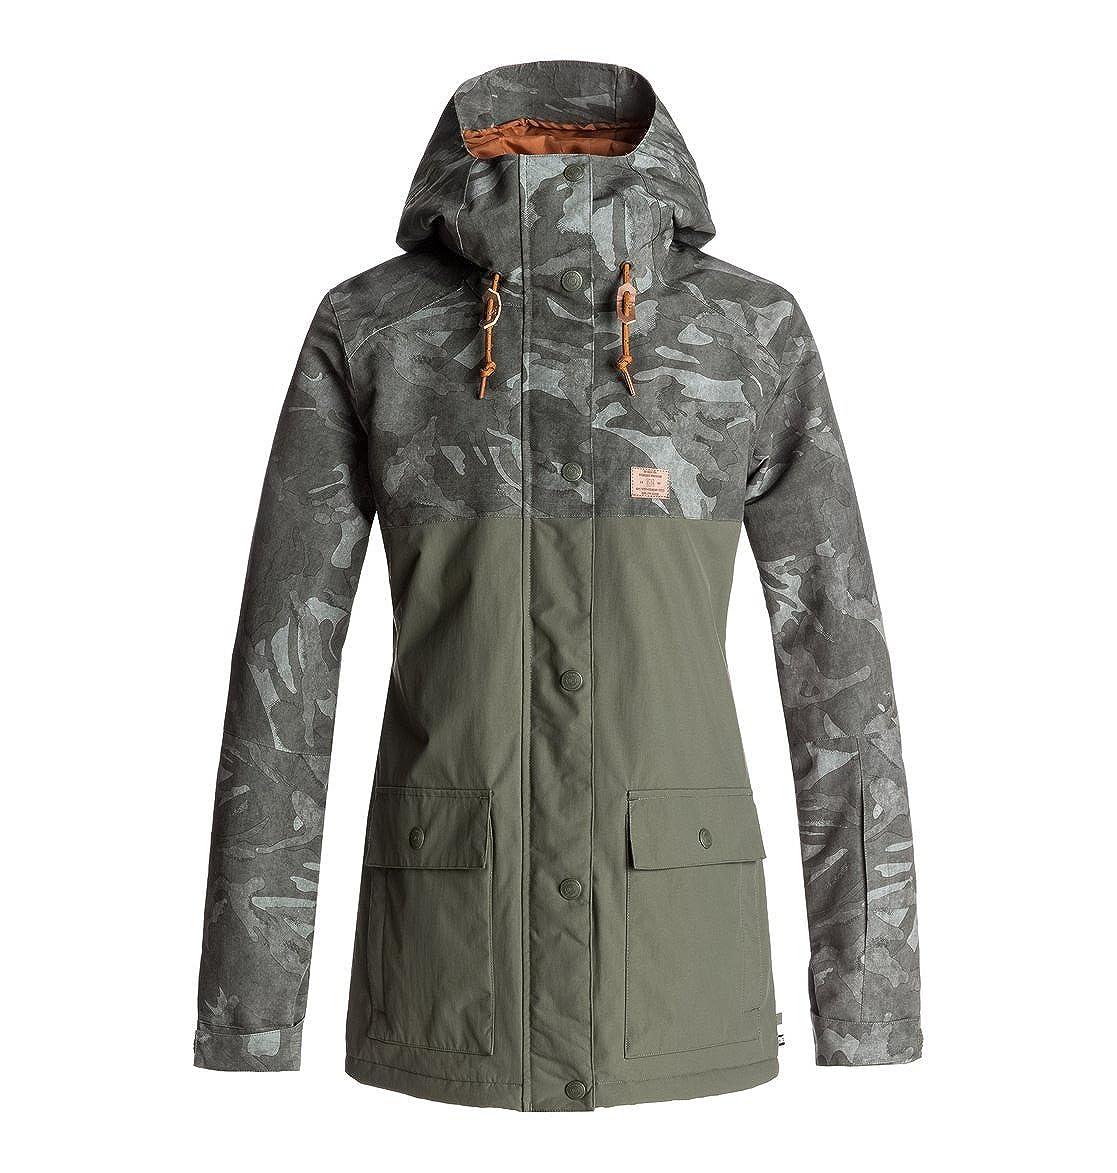 75d9b305963 DC Shoes Cruiser - Snow Jacket for Women EDJTJ03028  DC Shoes   Amazon.co.uk  Clothing